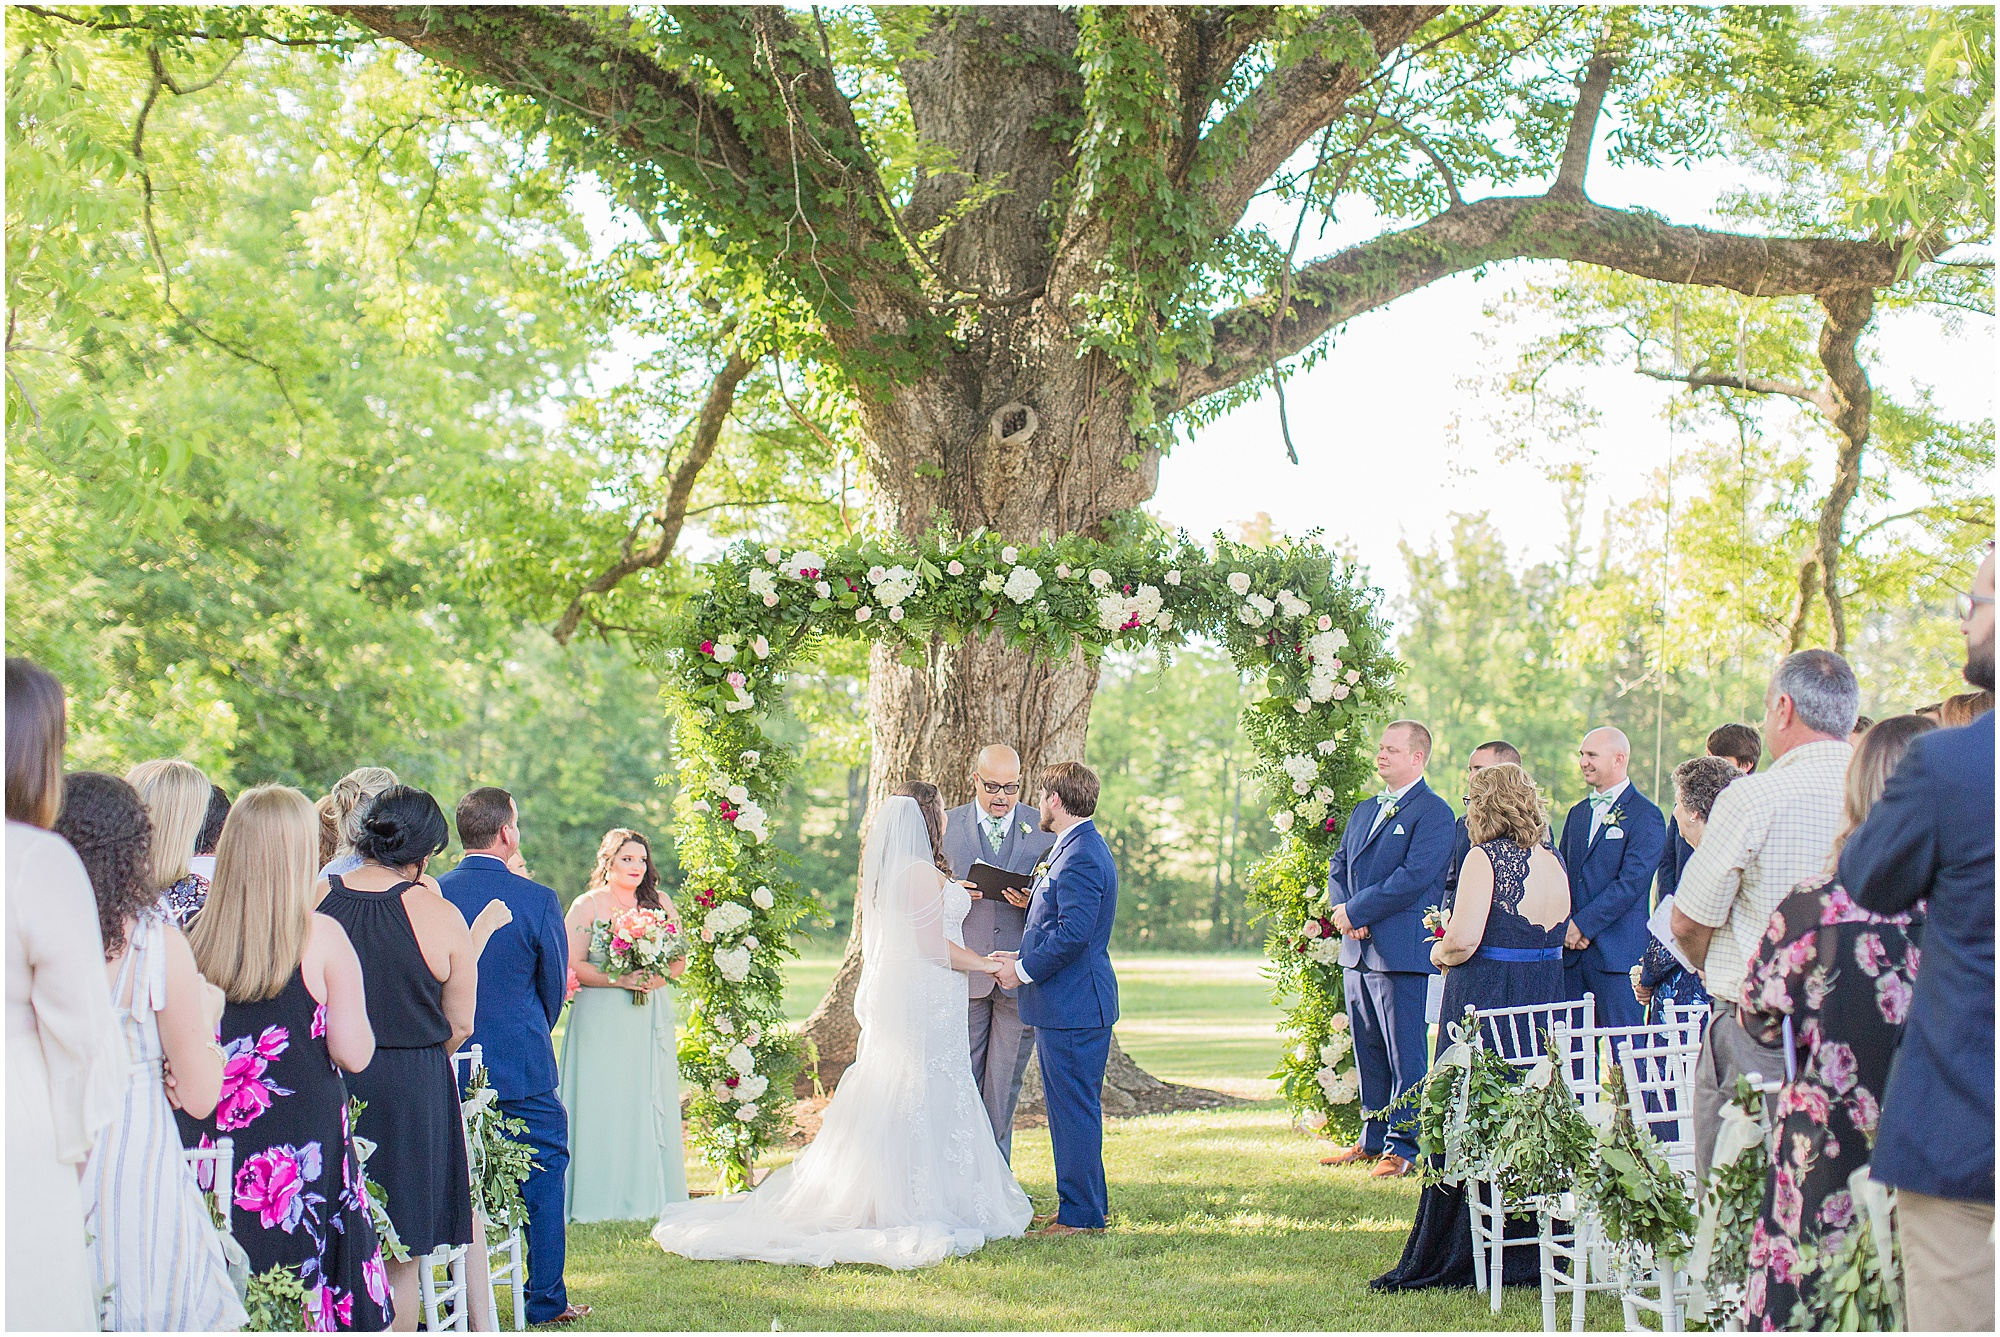 starkville-mississippi-wedding-page-place-dodson-farms_0061.jpg